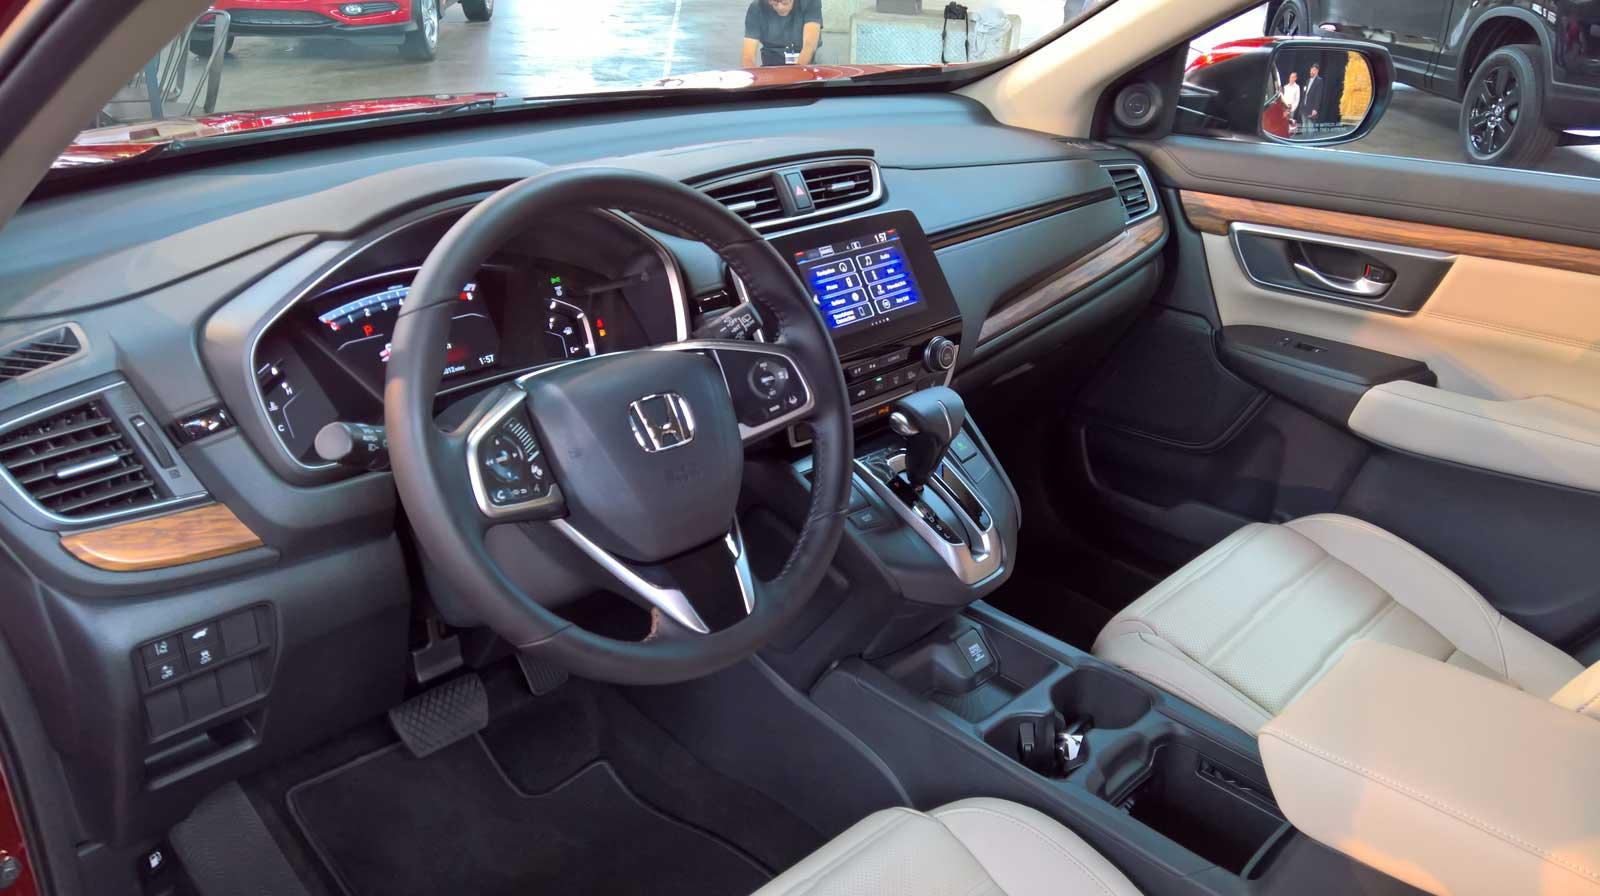 Crv 2017 Interior >> 39 Konsep Penting Interior Mobil Crv 2017